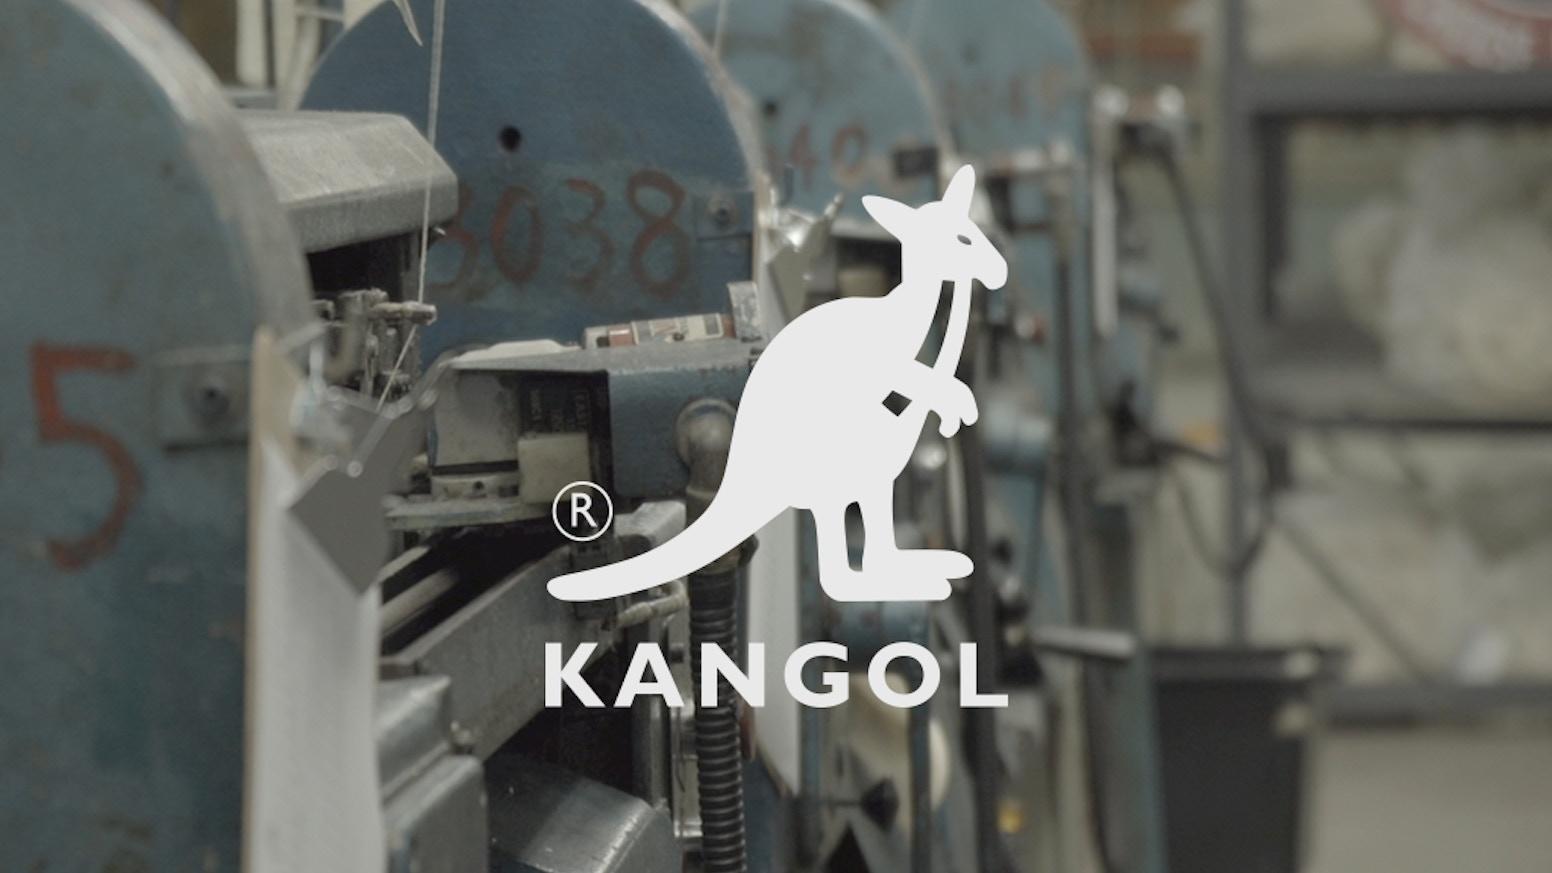 b109da0d Kangol 504: Bring Jobs To America With Bollman Hat Company by ...